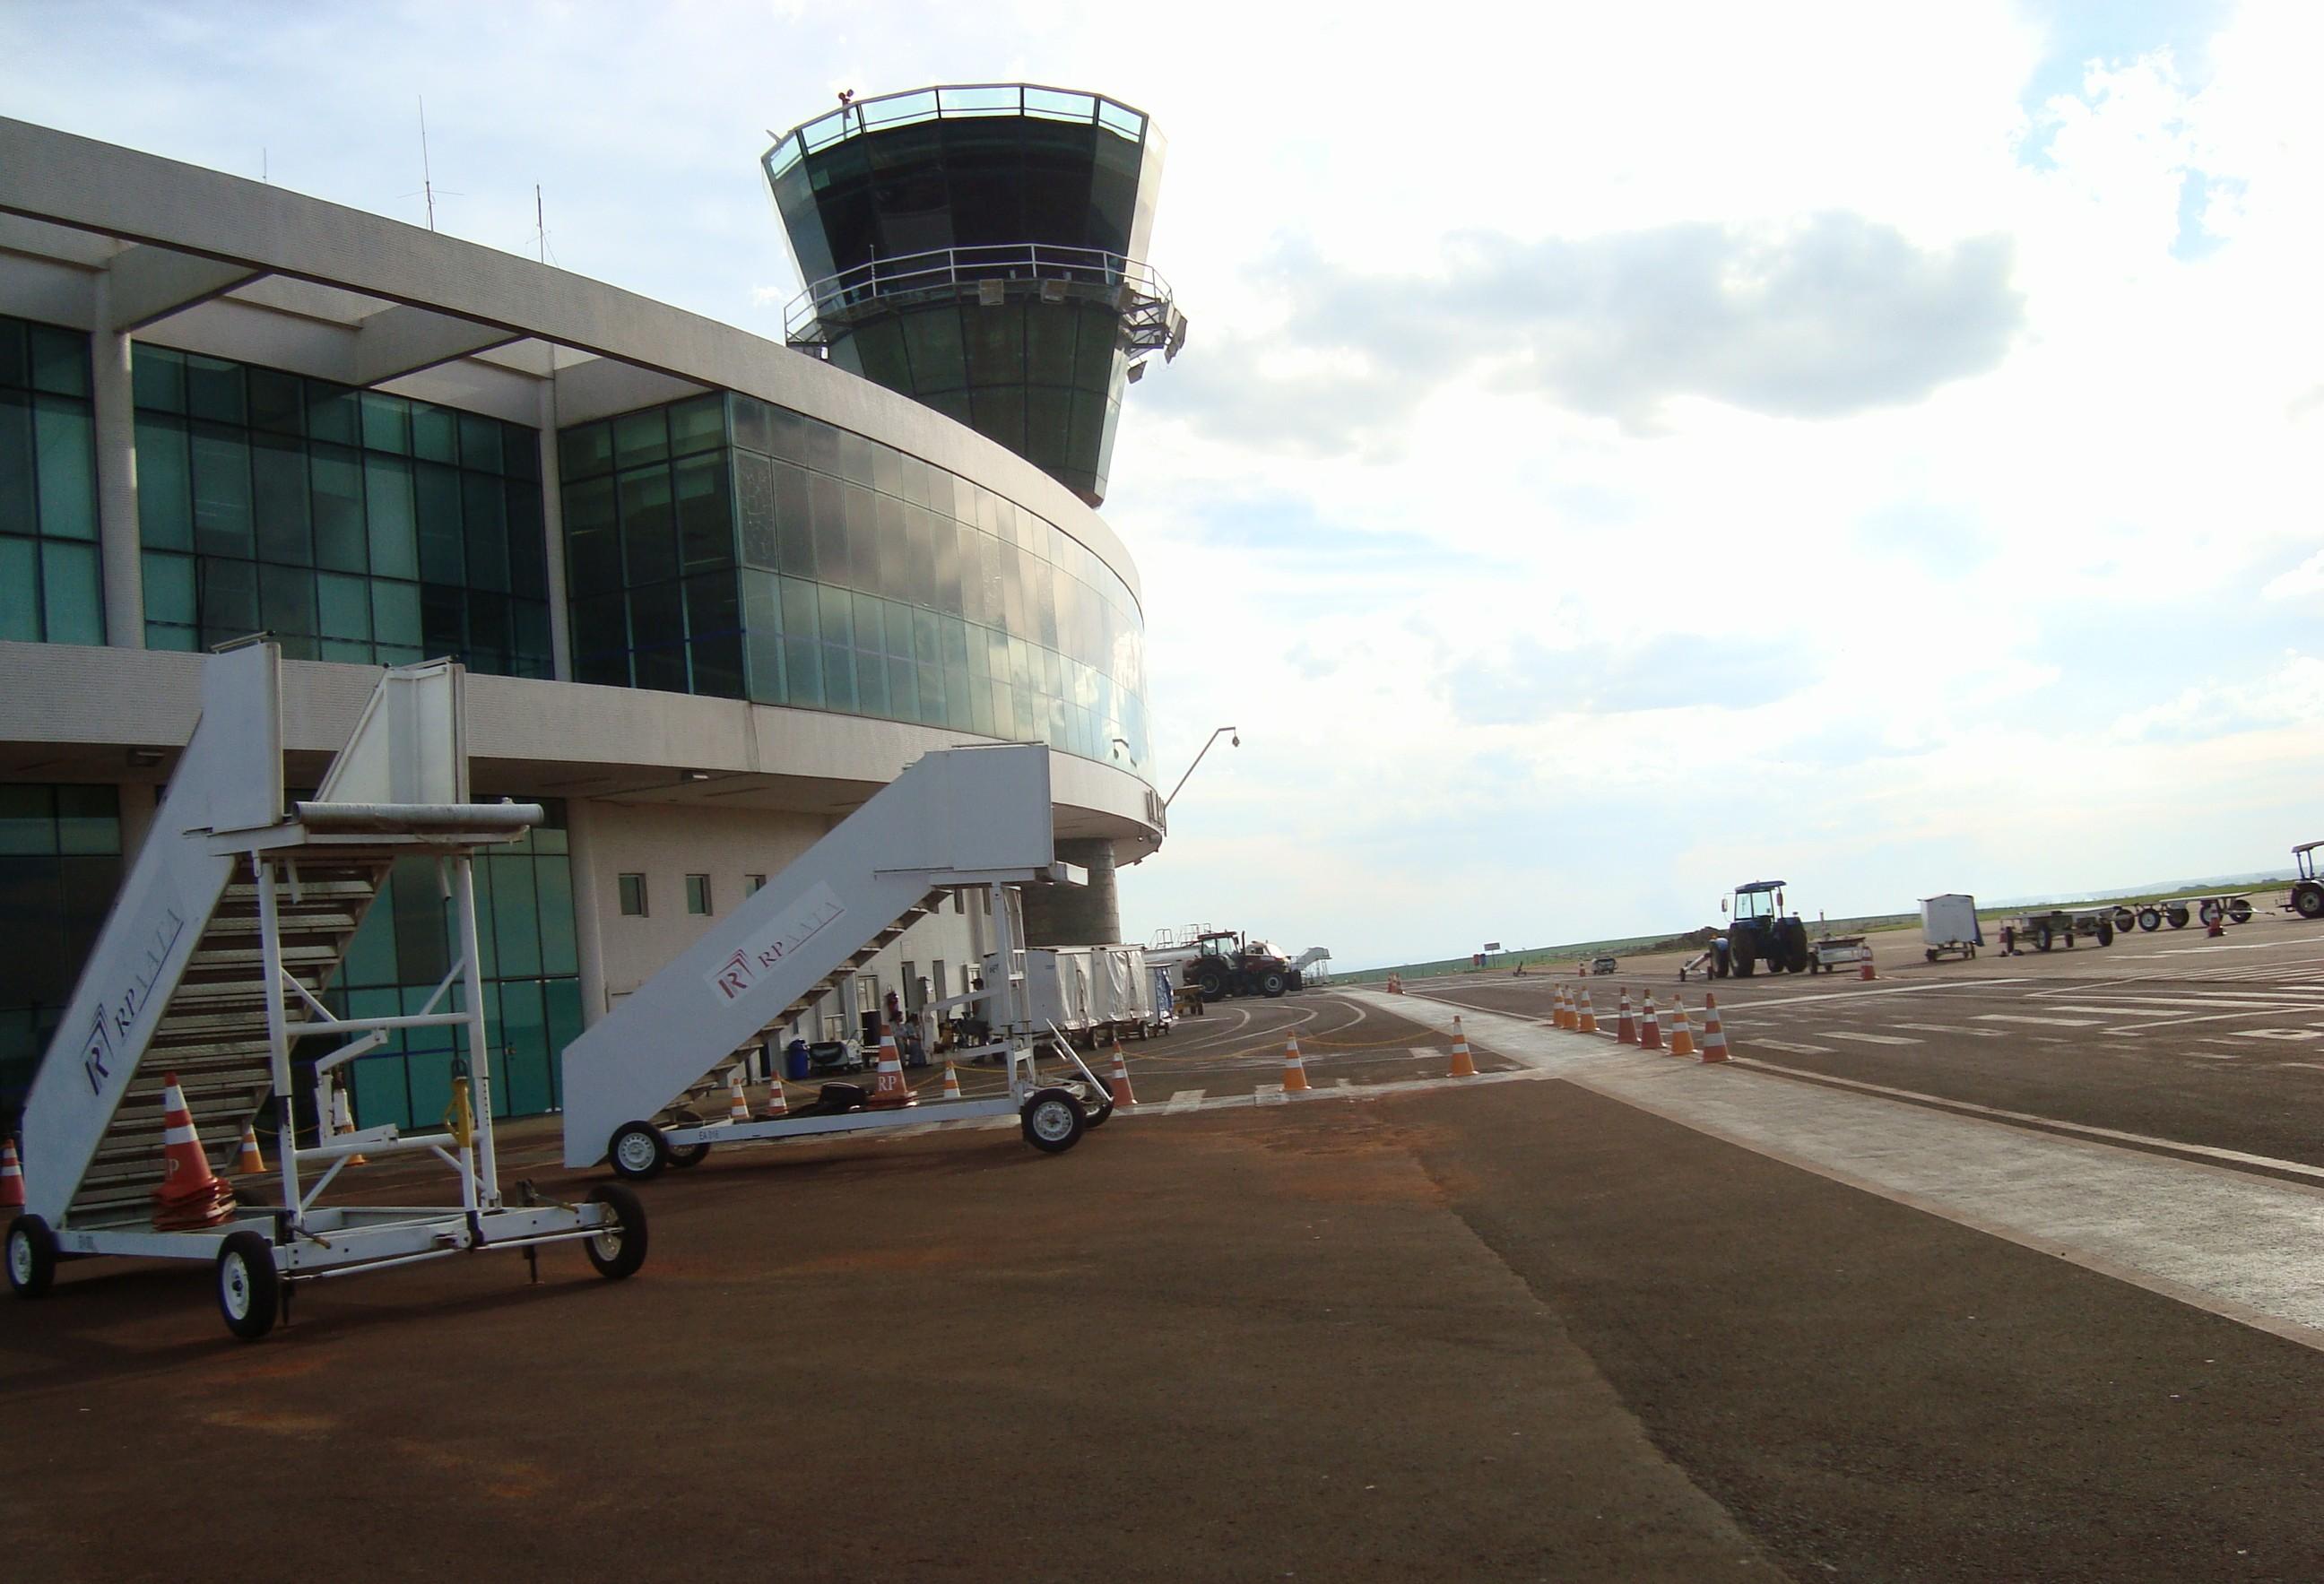 Estacionamento para embarque e desembarque no aeroporto é ampliado